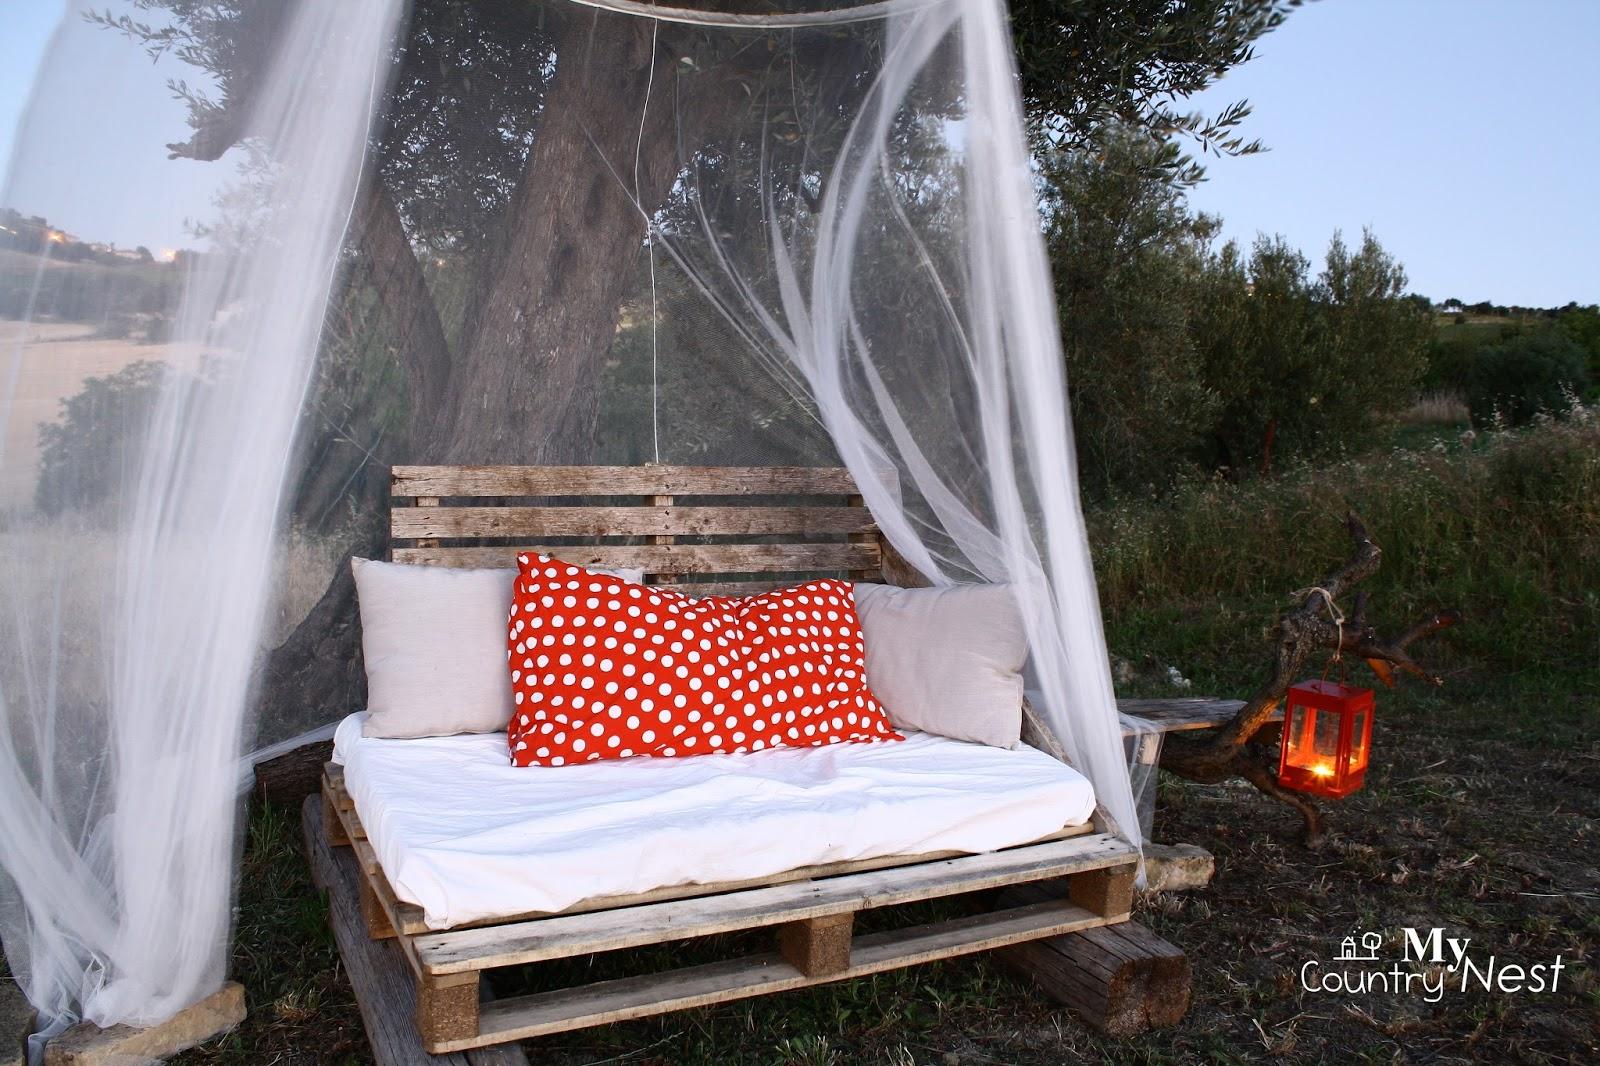 My country nest riciclo diy pallet per un divano rustico - Creare un divano ...